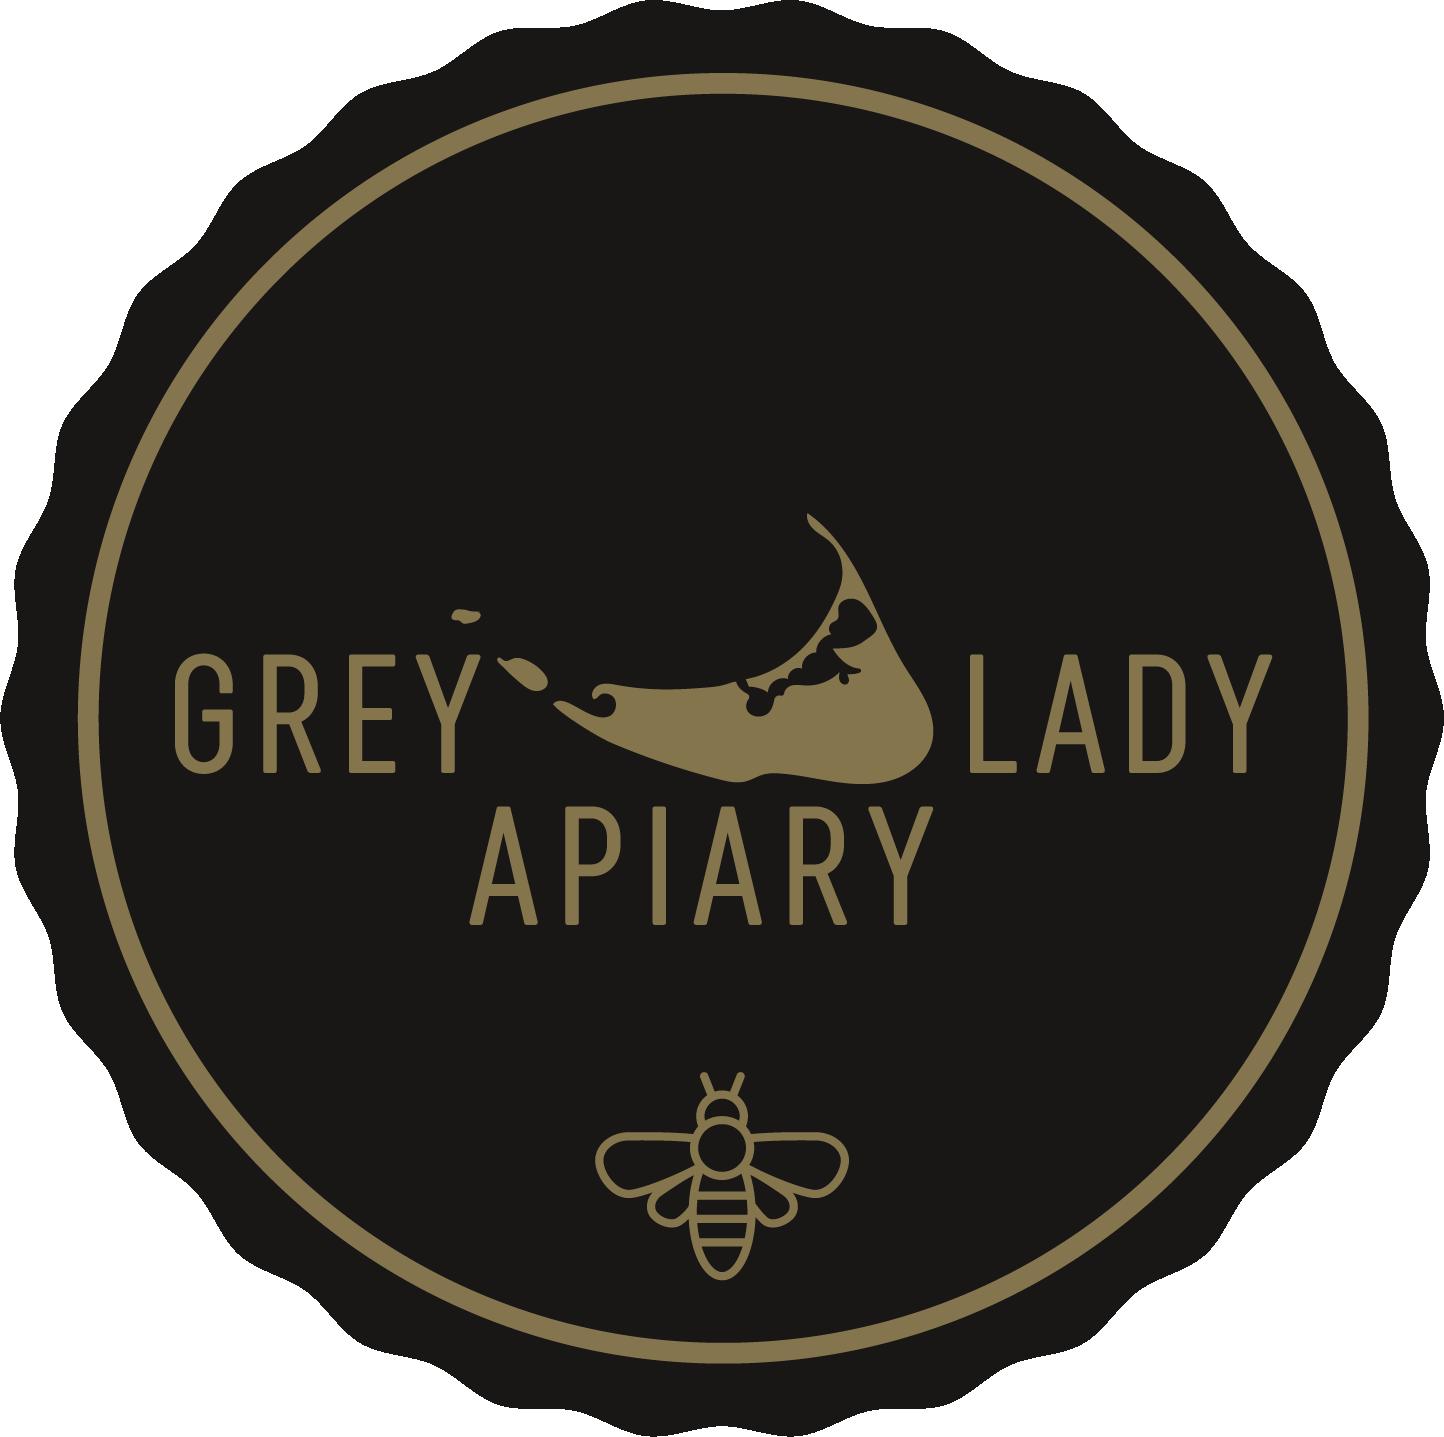 Grey Lady Apiary